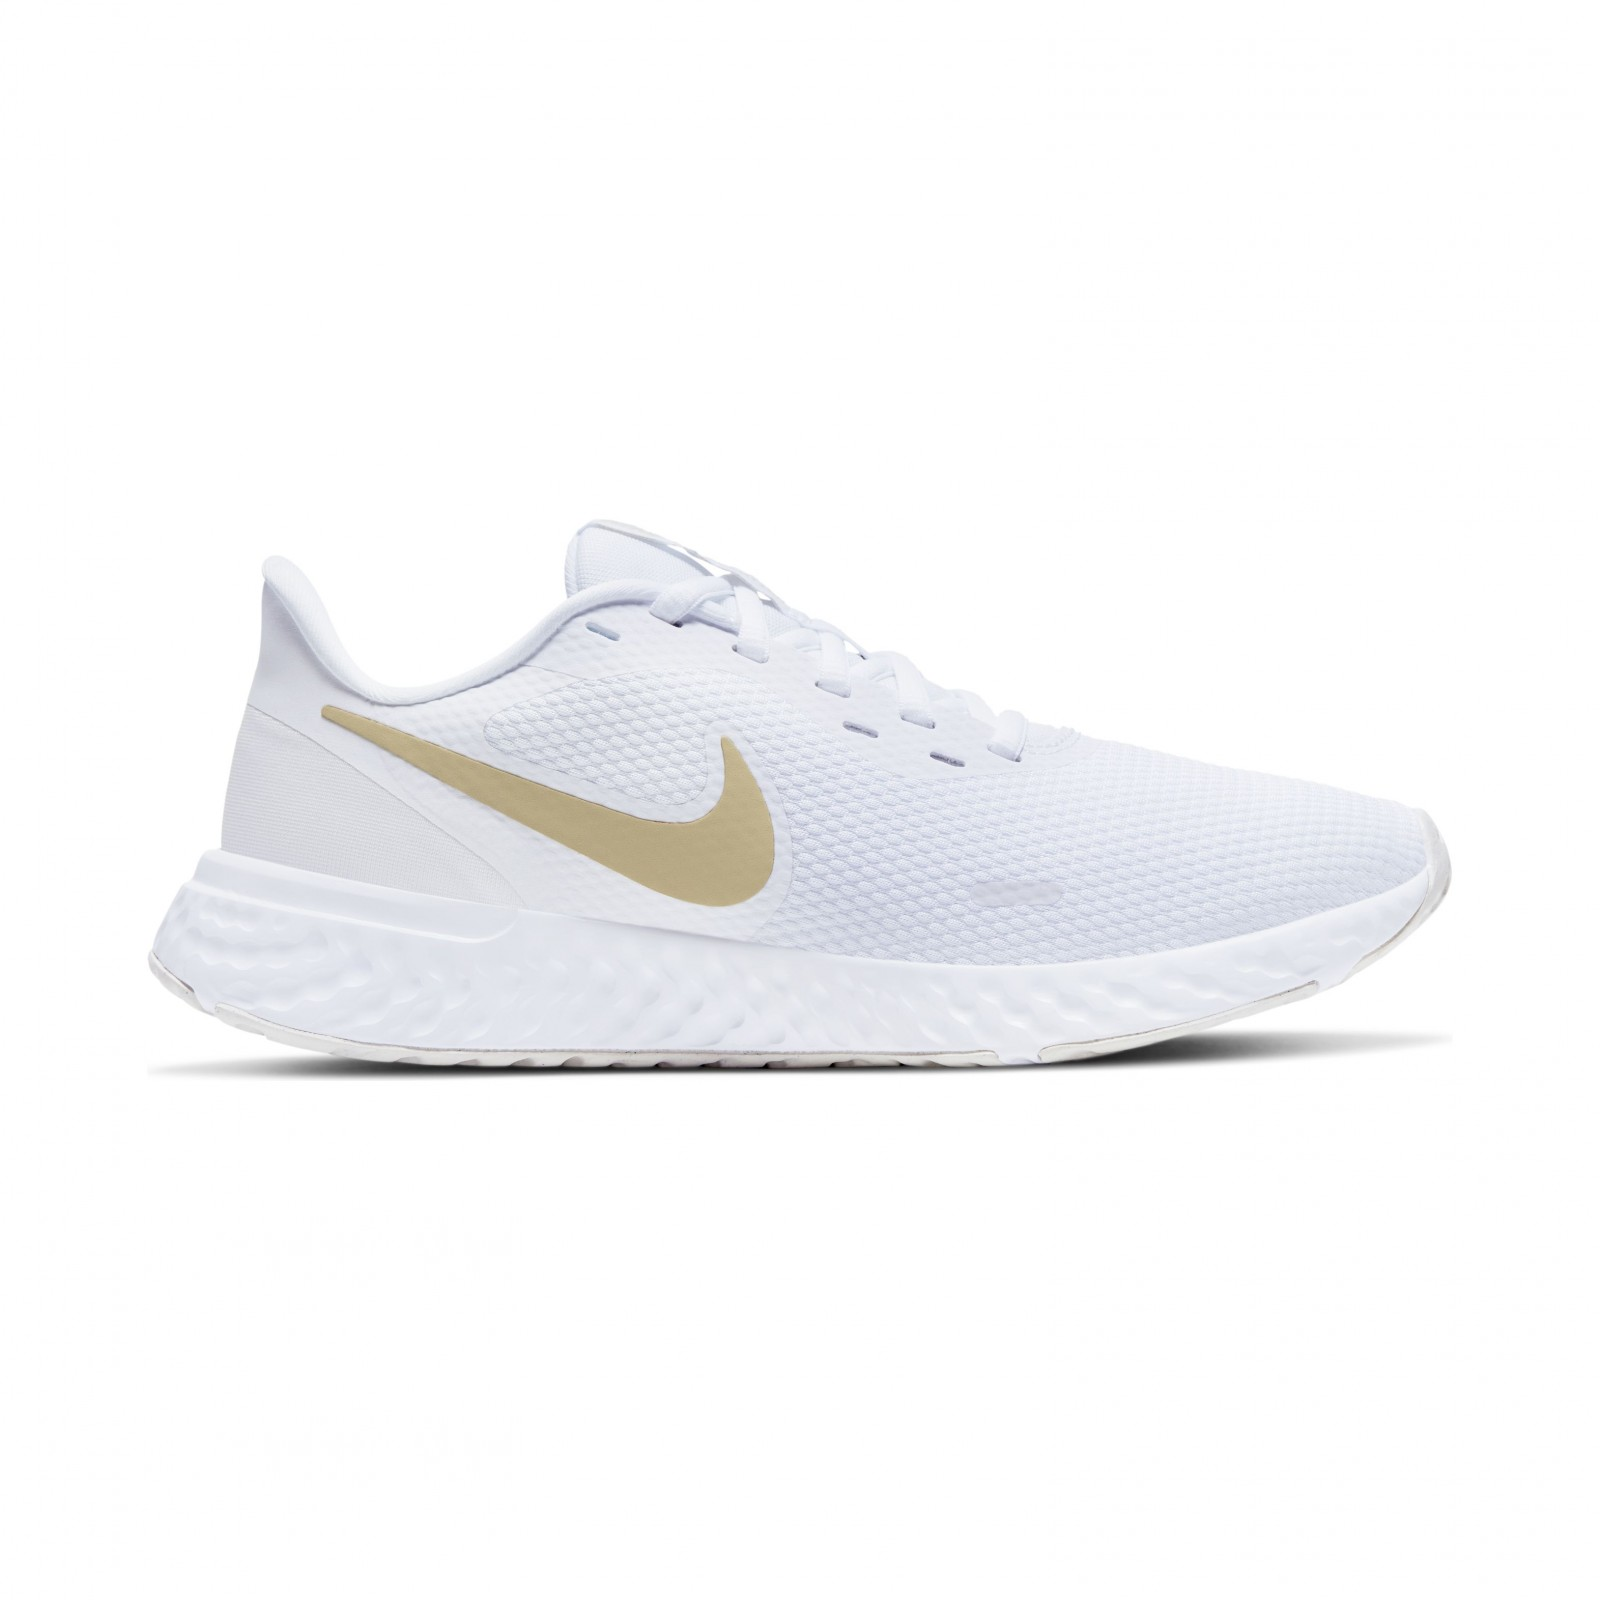 Nike Revolution 5 WHITE/MTLC GOLD STAR-PLATINUM TINT